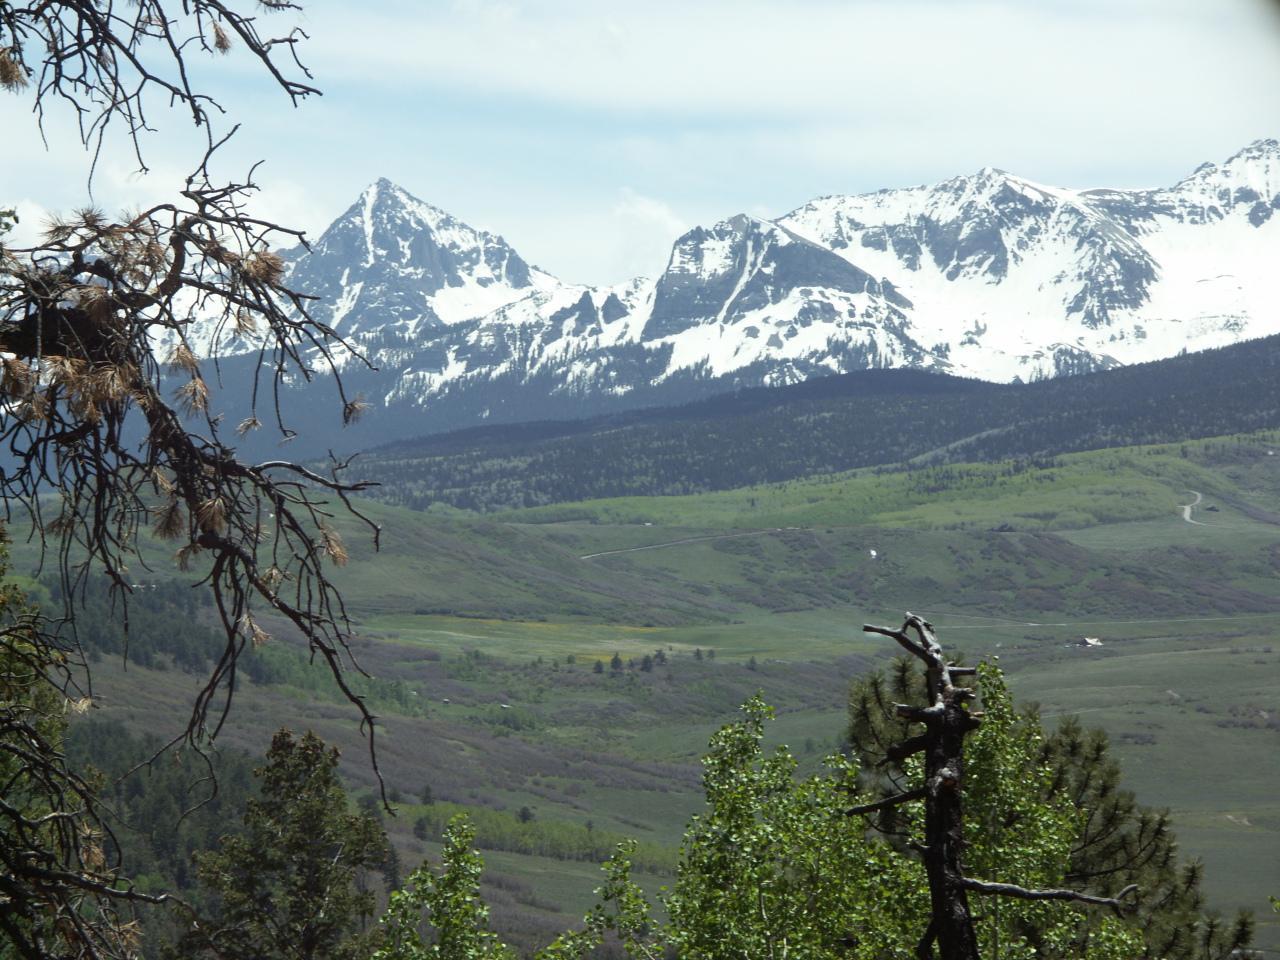 #4 Gracie Sky Mountain - Photo 1